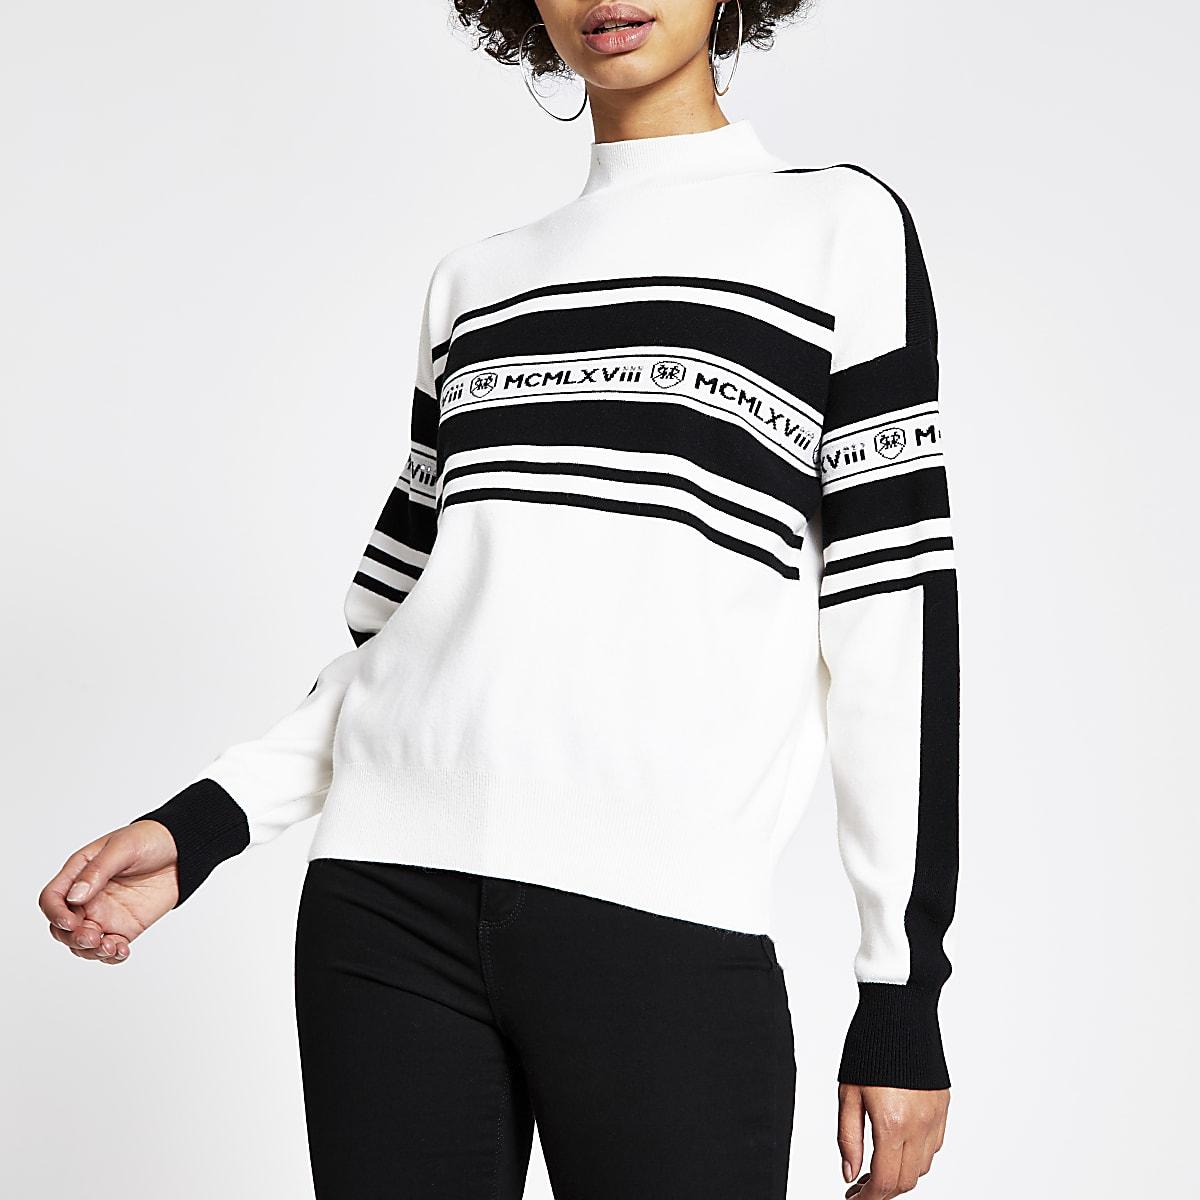 Crème'MCMLXVIII' pullover